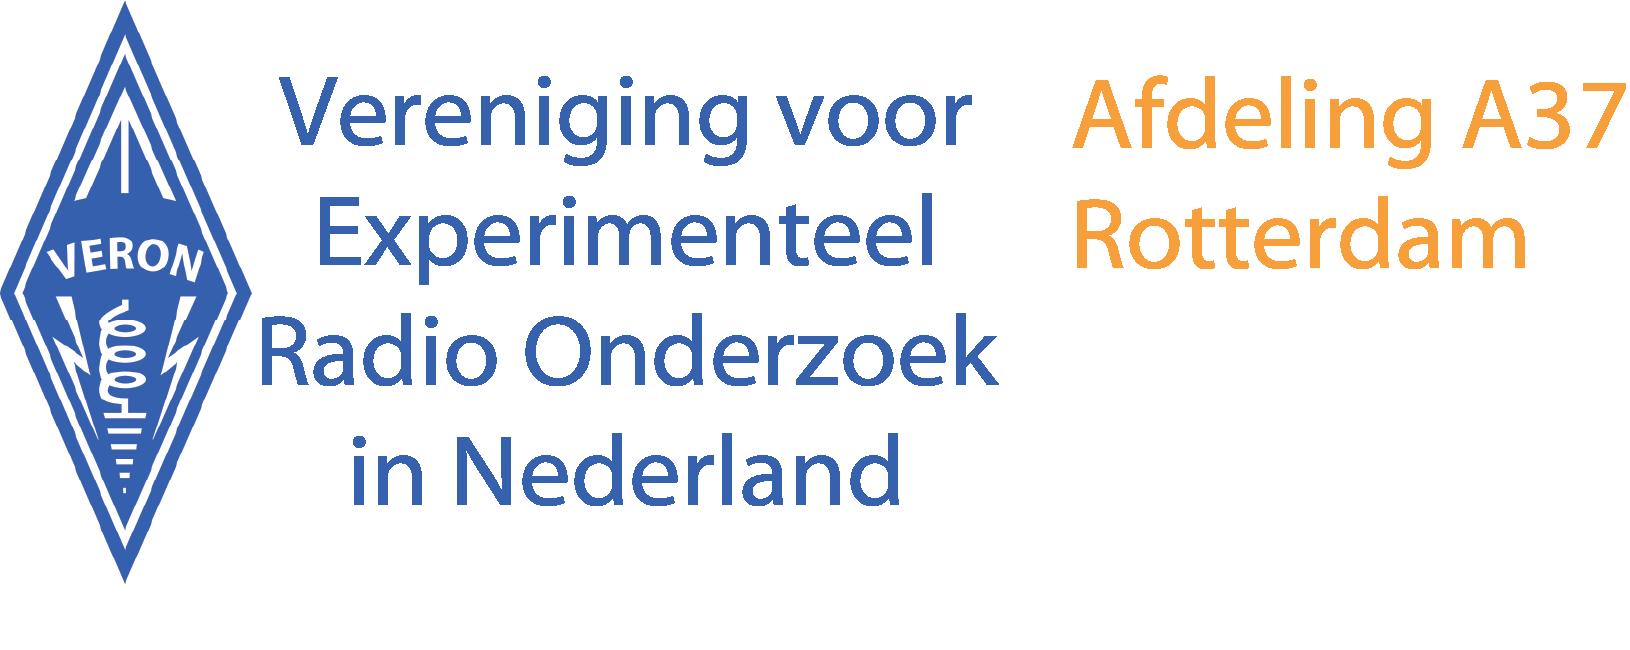 VERON A37 Rotterdam